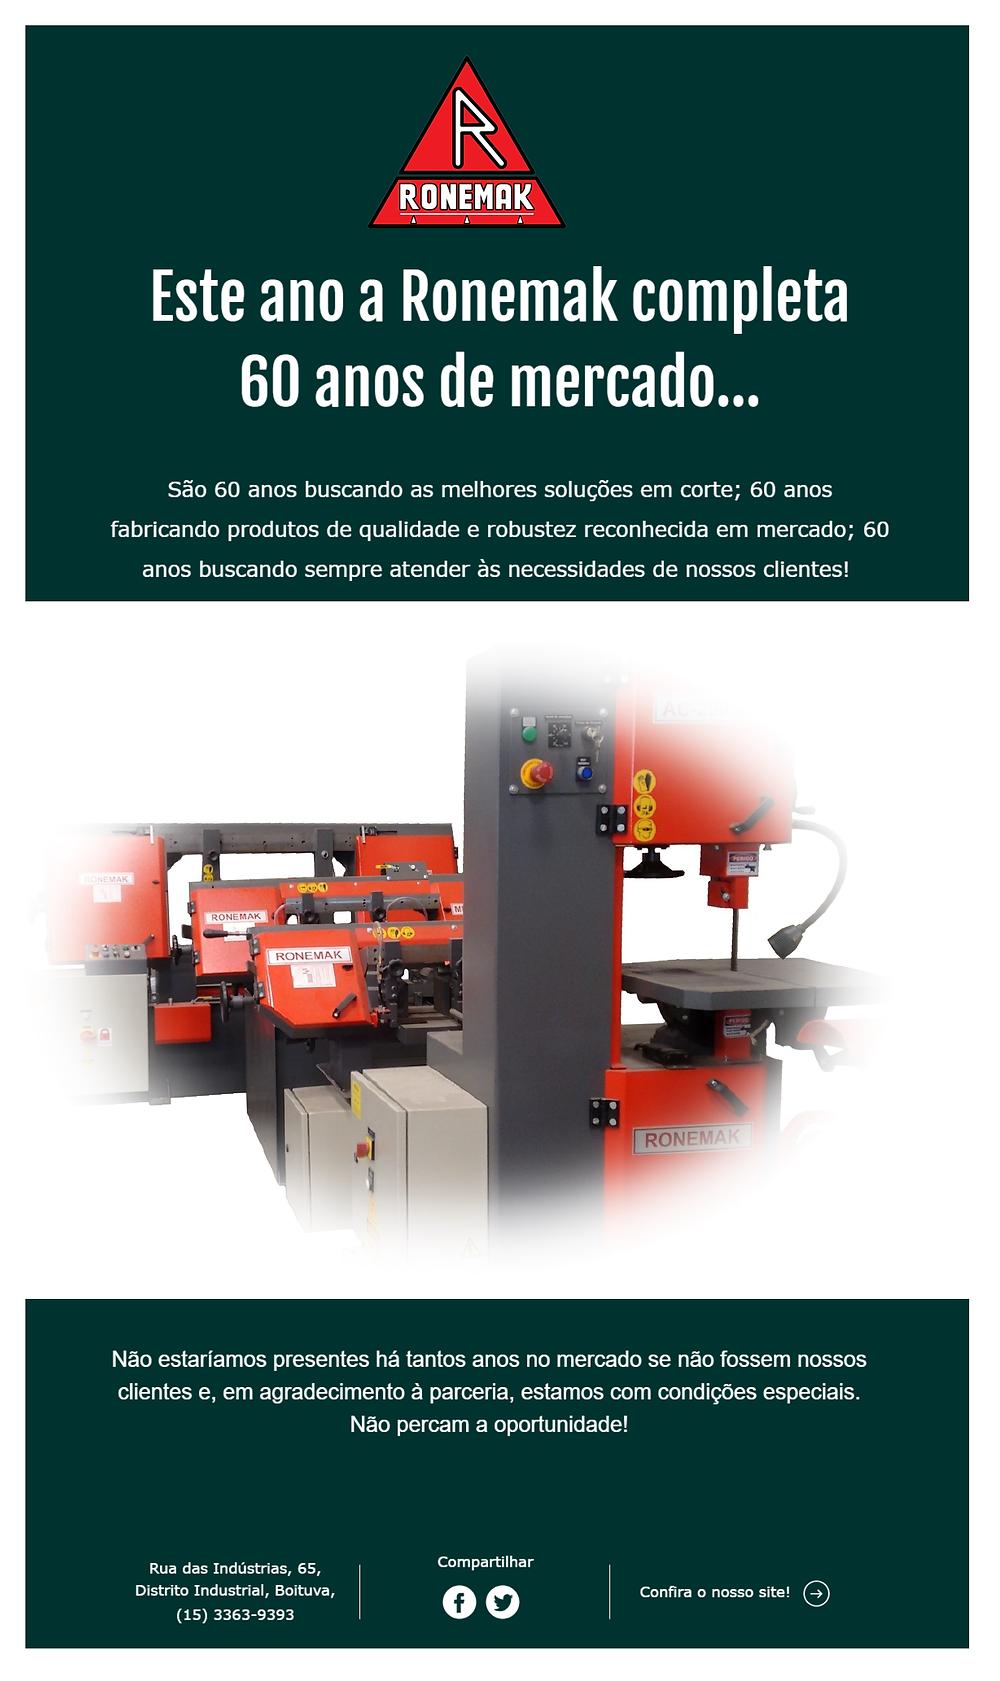 Fabricante de máquinas serra de fita, cortadores de tubos e afins